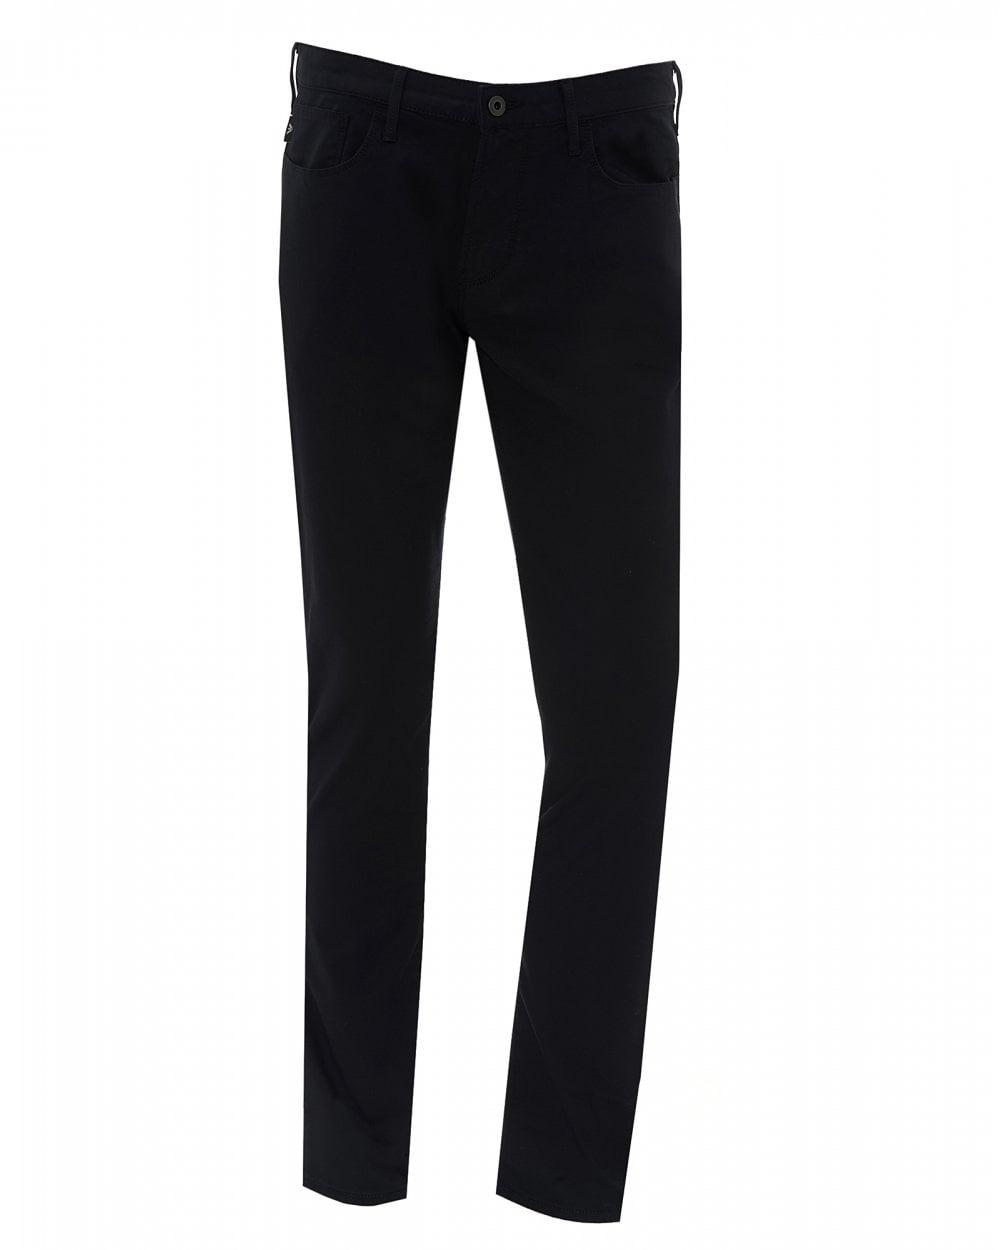 30a012cebf Mens J06 Navy Gabardine Jeans, Slim Fit Stretch Cotton Denim